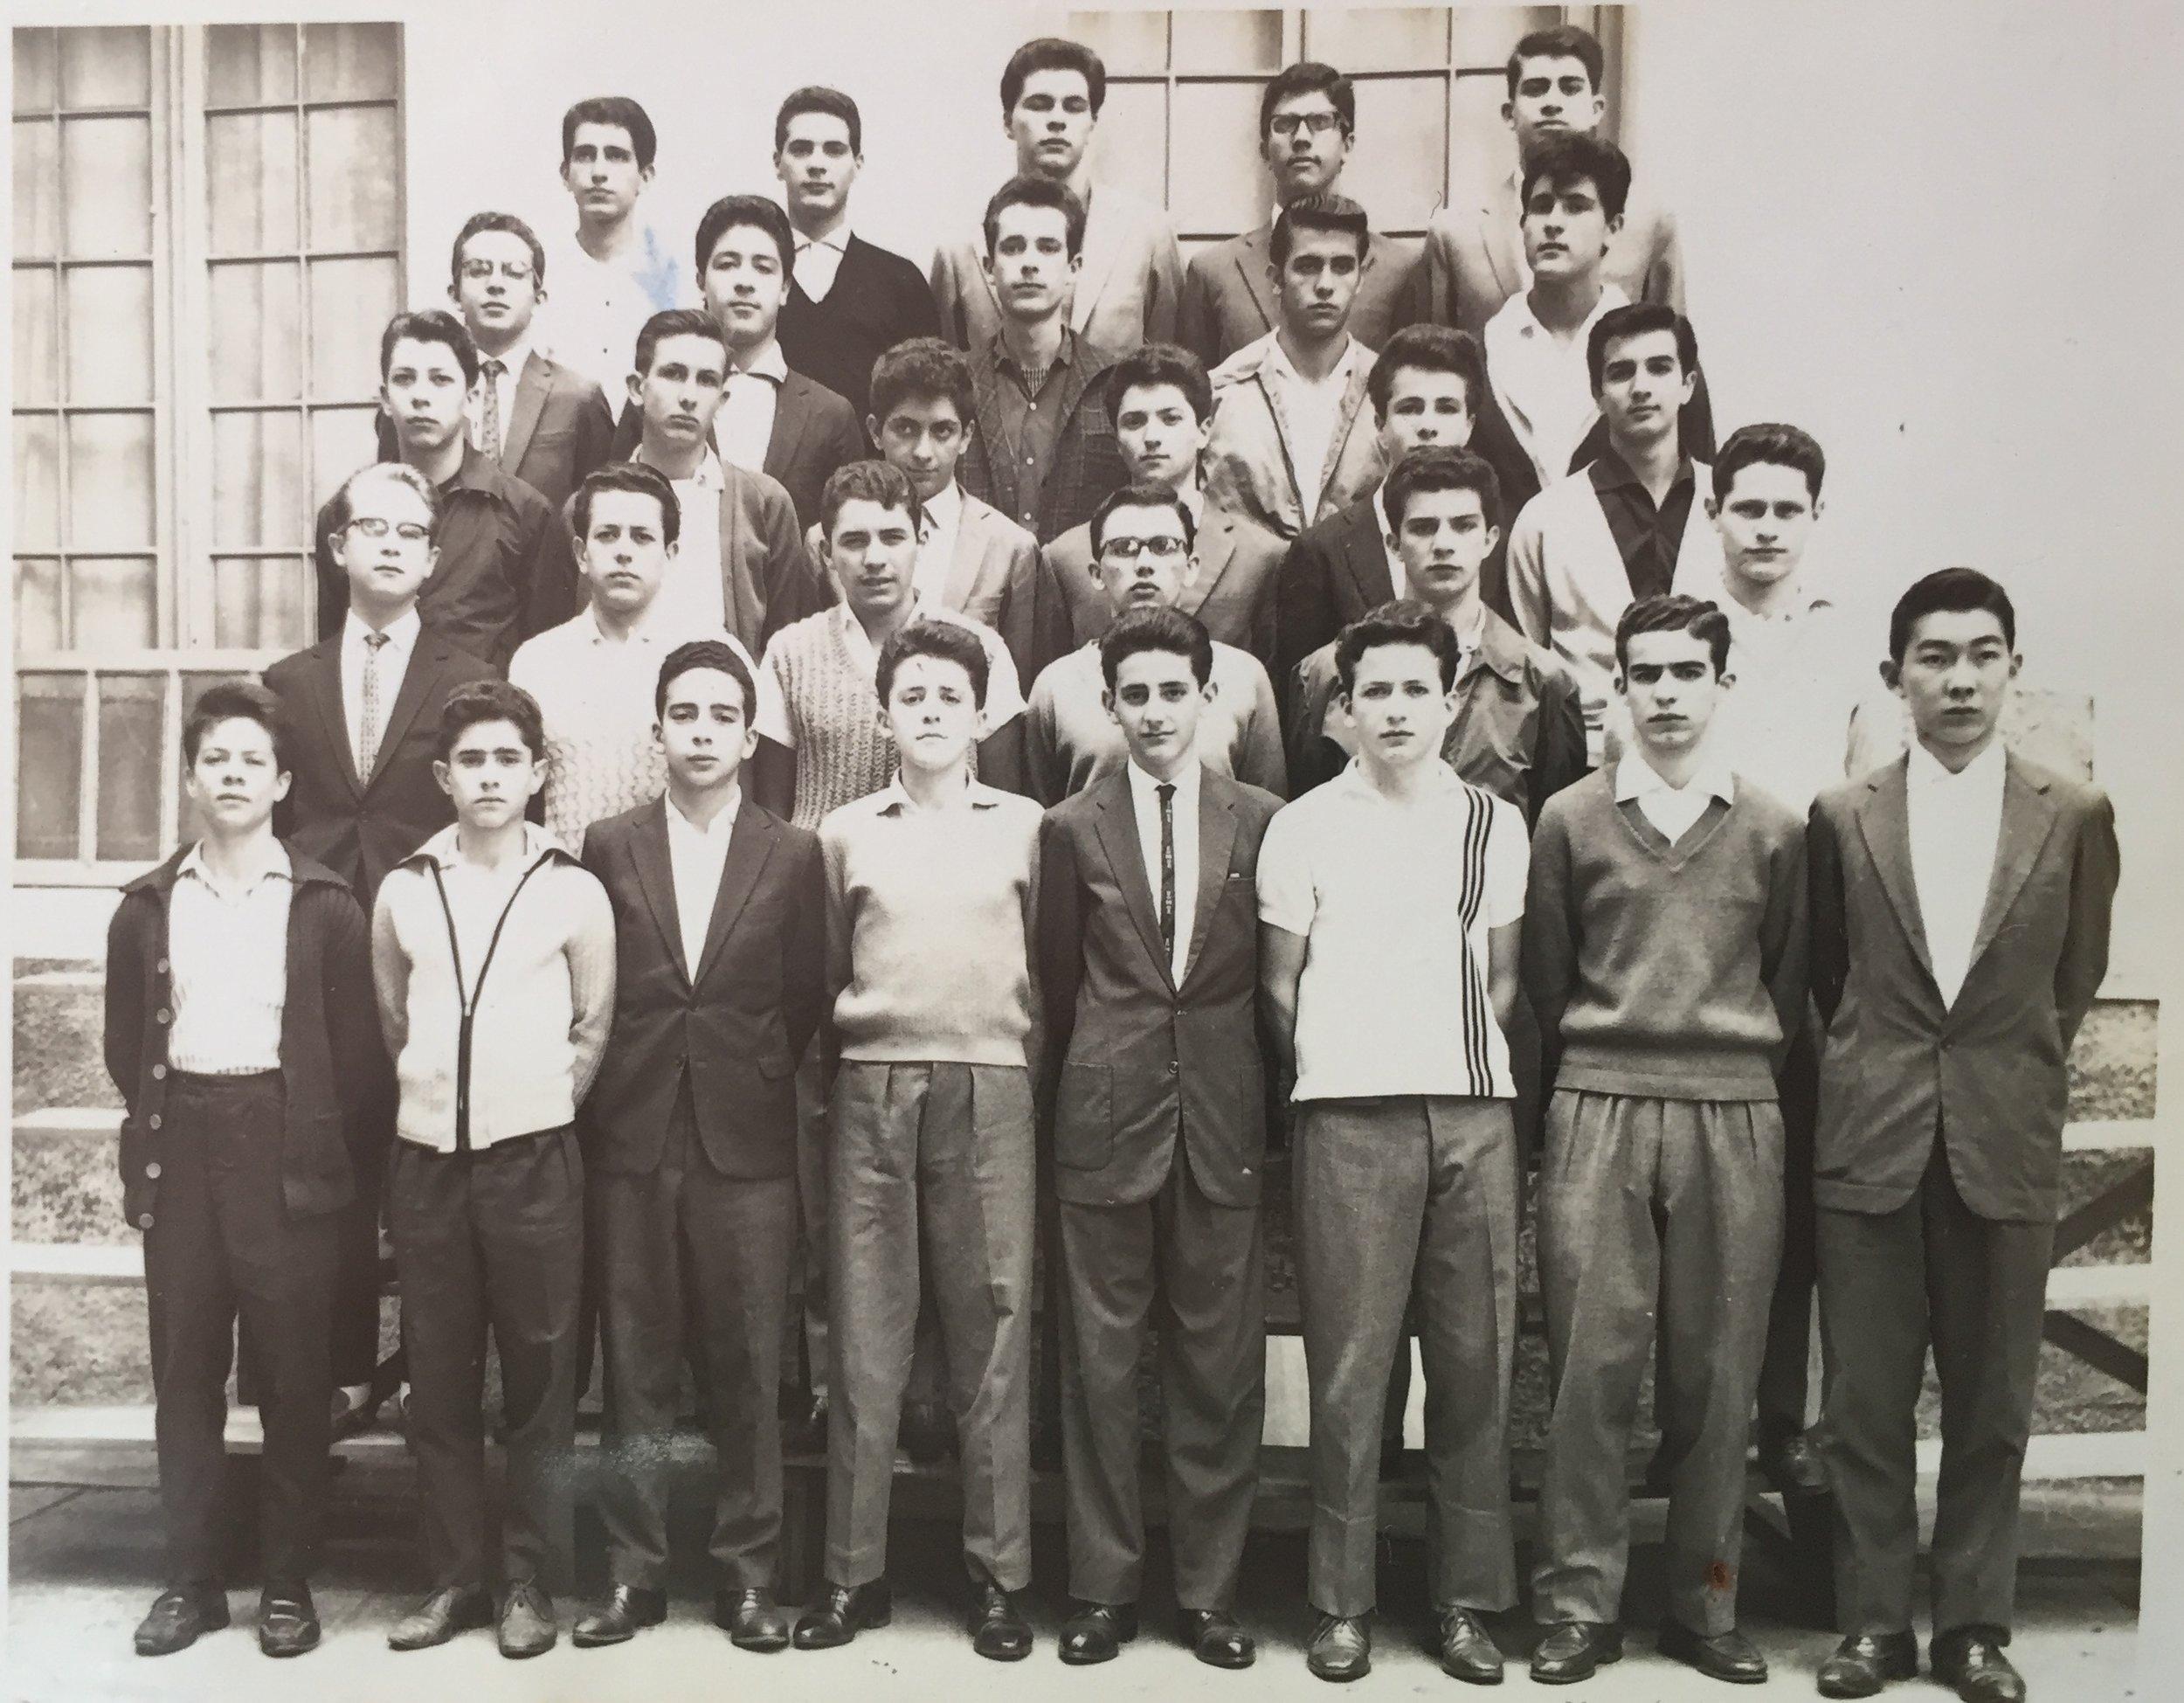 CARMO 1o Cientifico - 1961.jpg